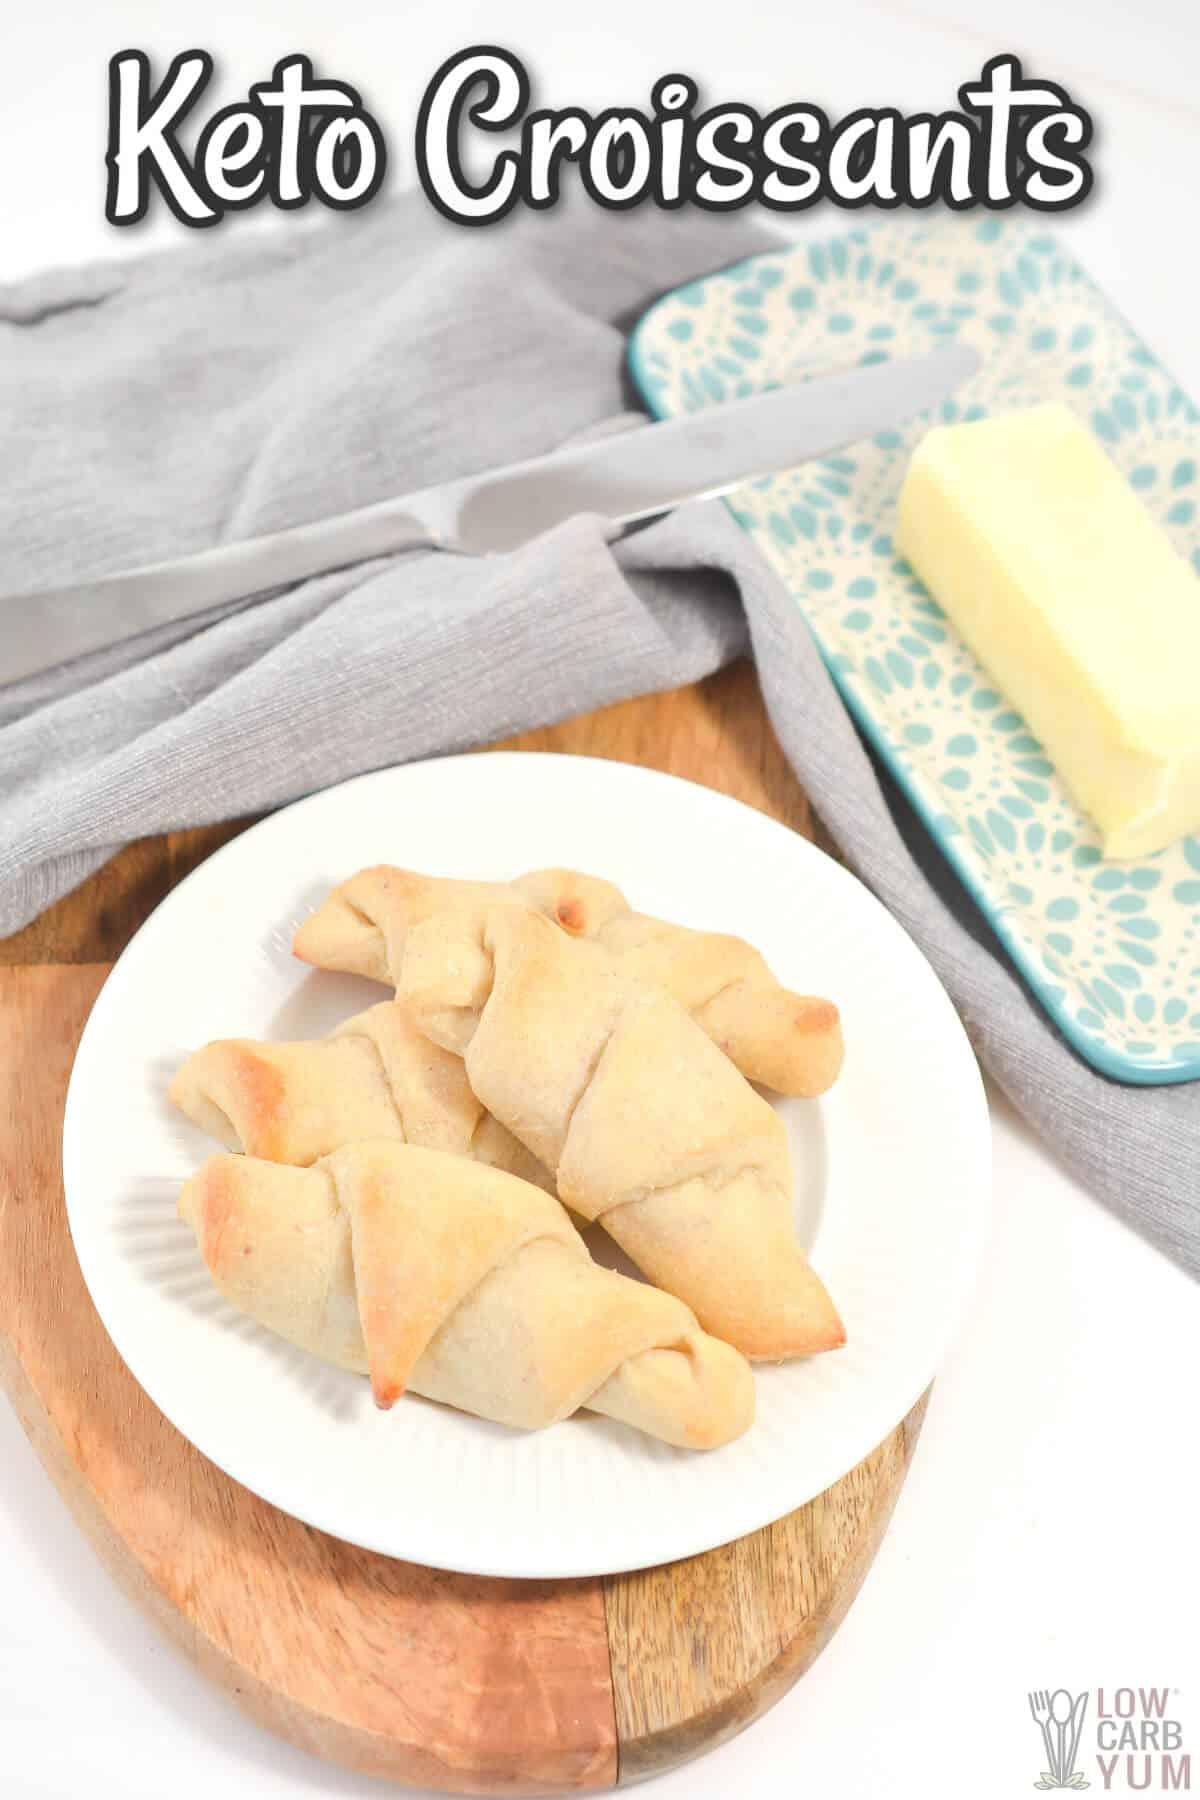 keto croissants cover image